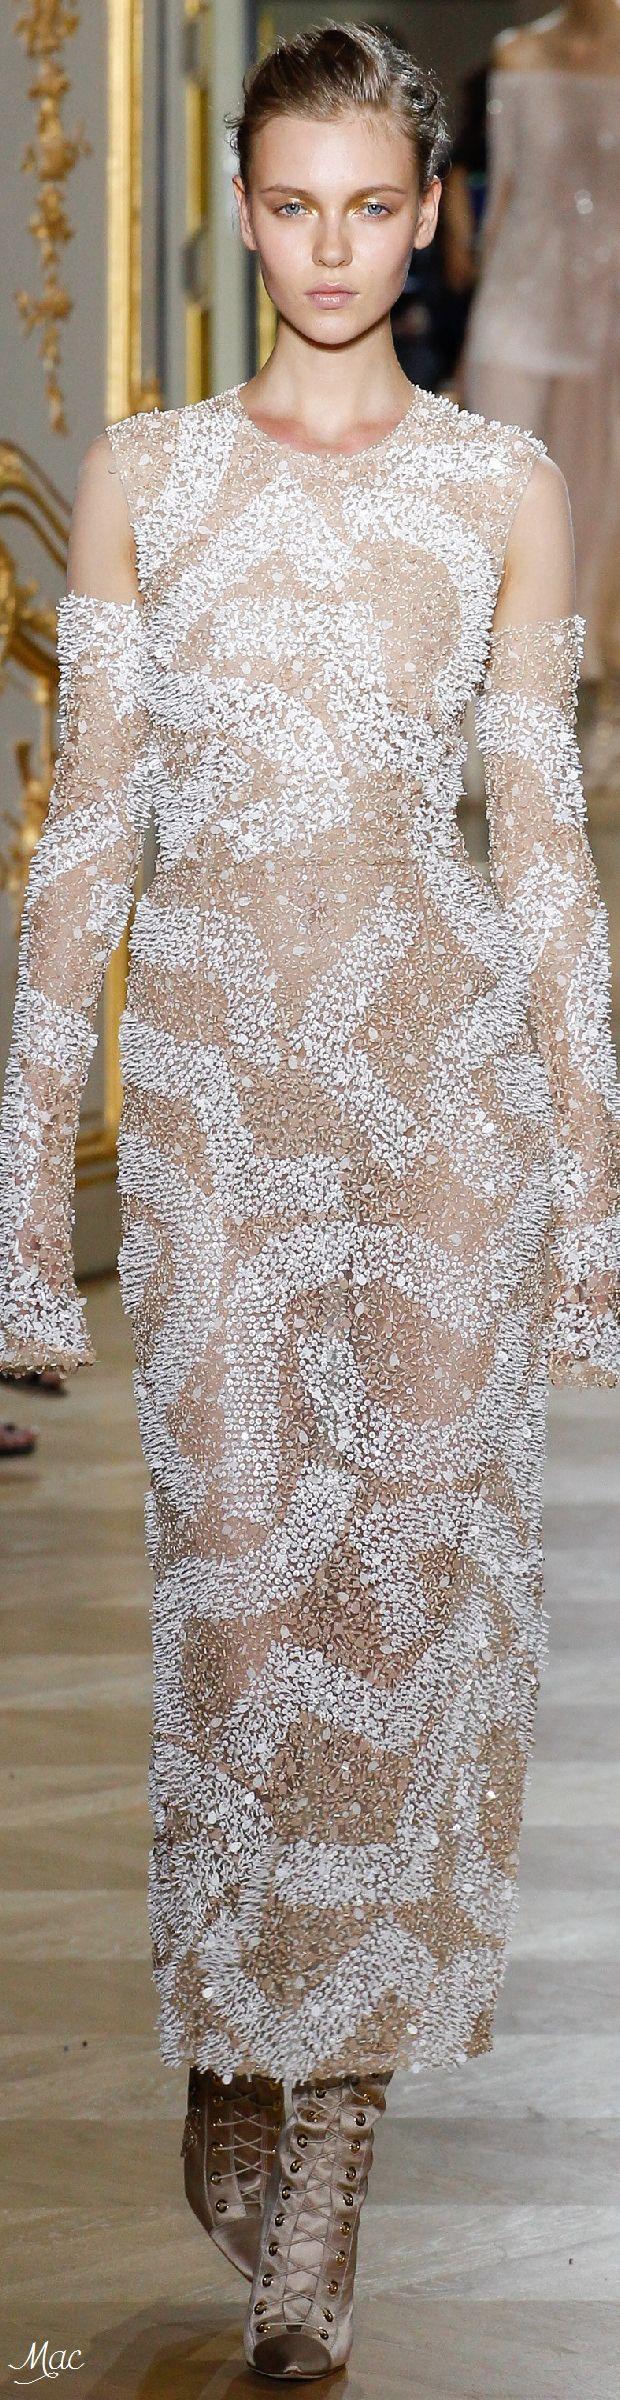 Fall 2016 Haute Couture - J. Mendel